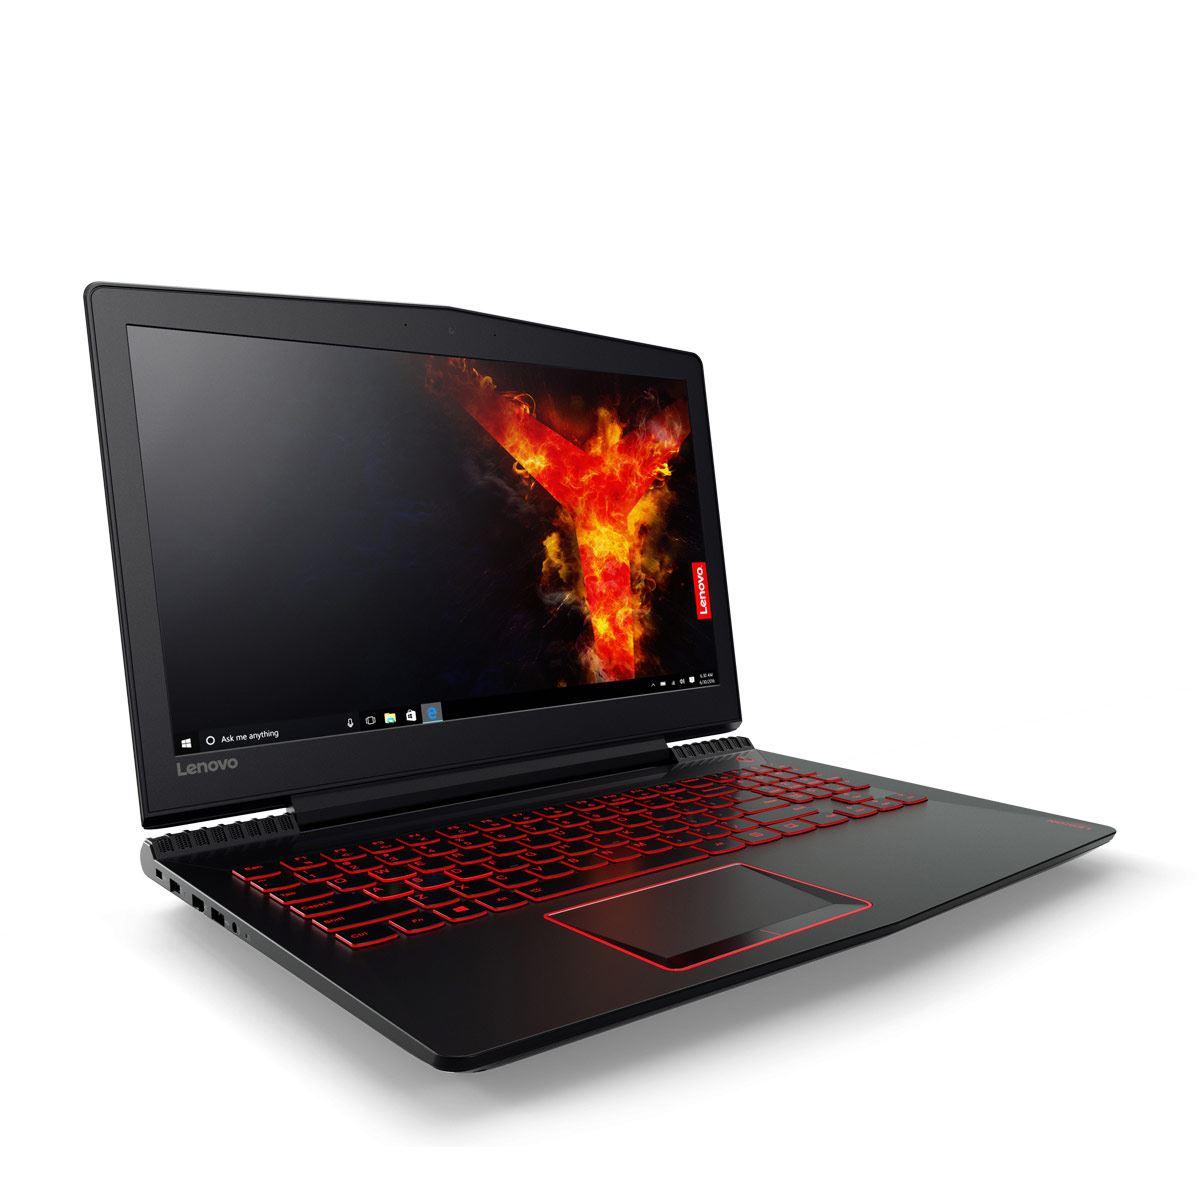 Laptop gamer y520-15ikbn lenovo  - Sanborns